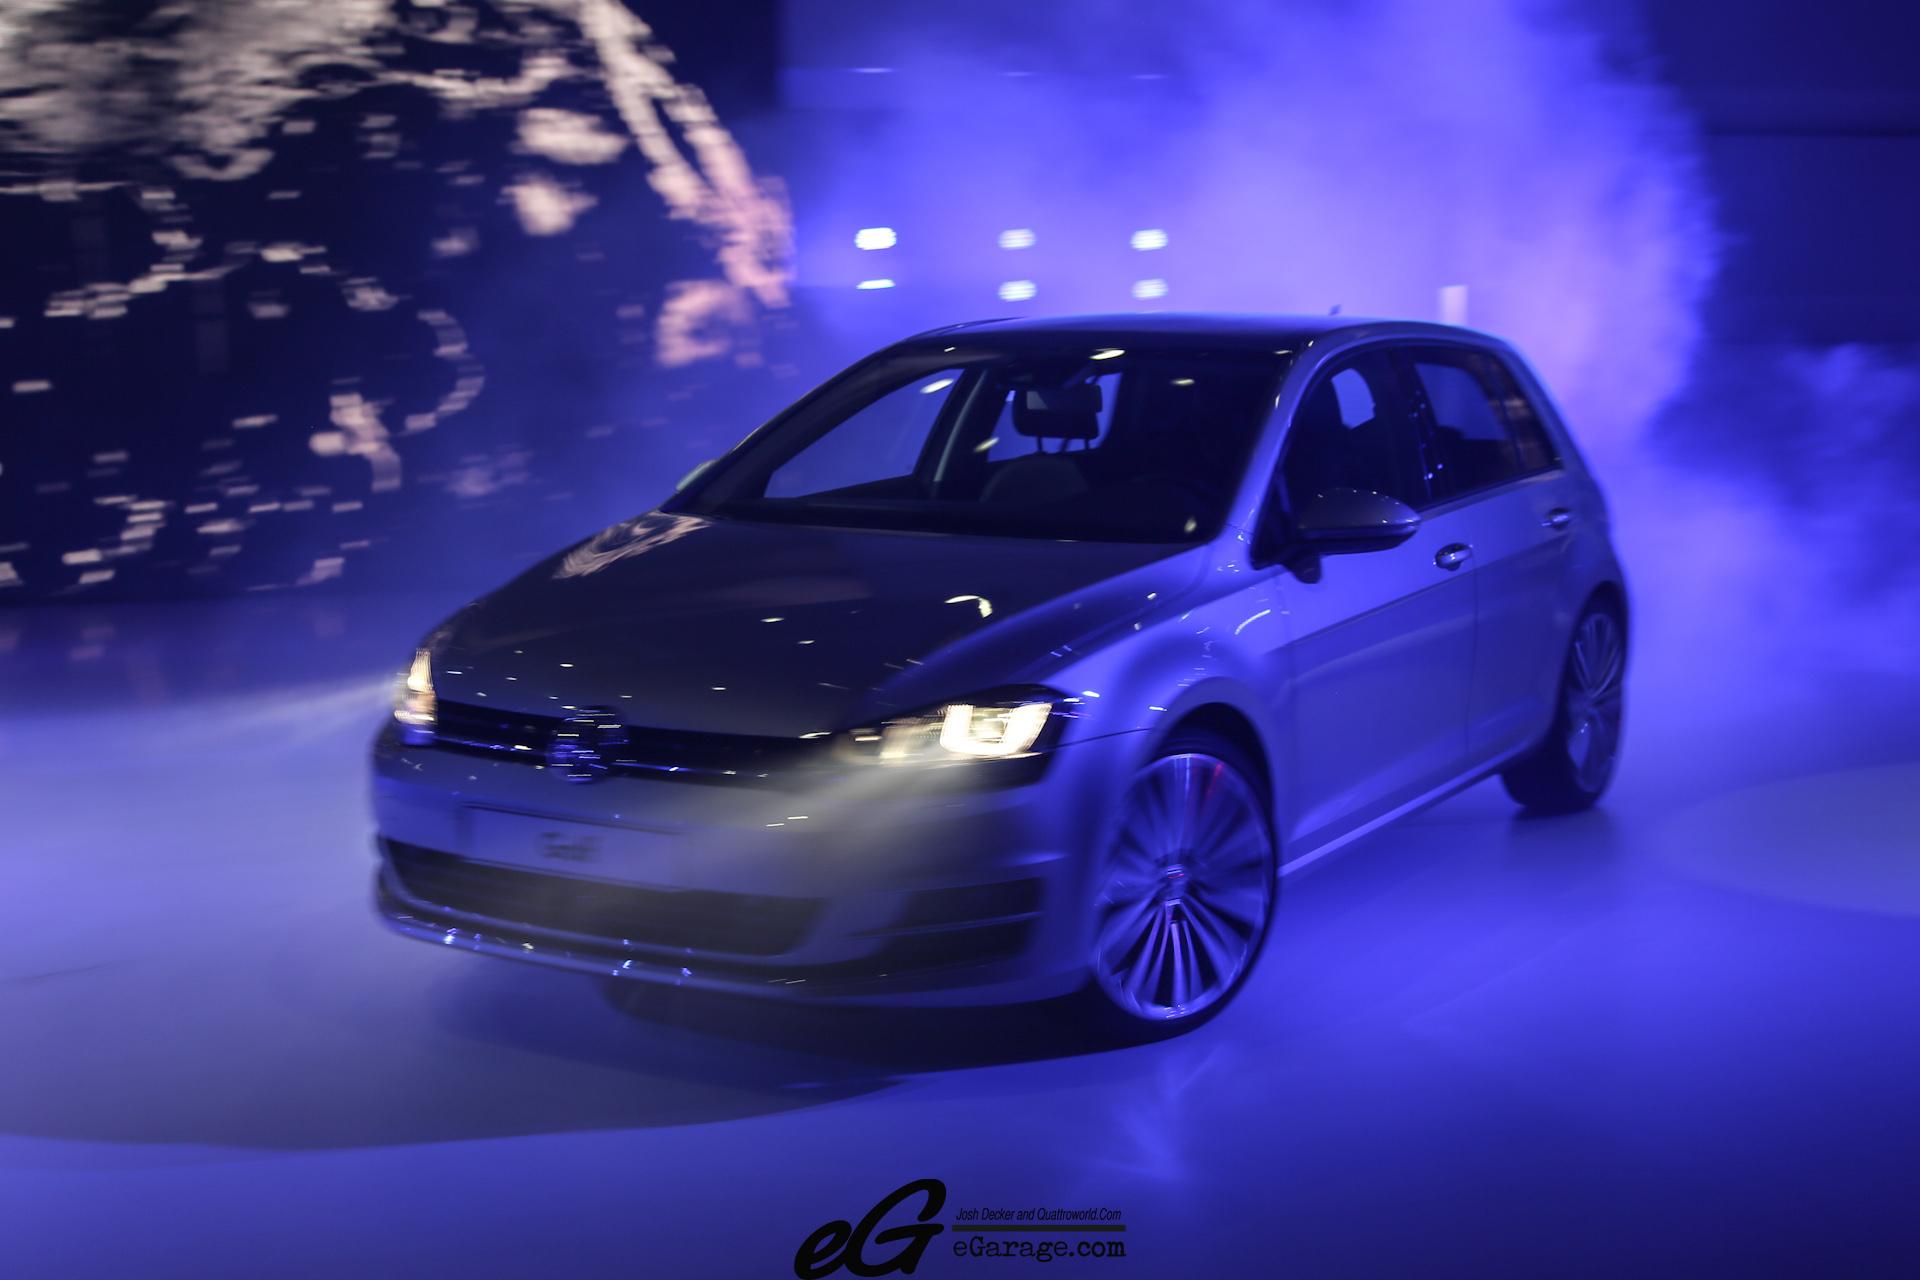 8030379302 d0b1625687 o 2012 Paris Motor Show